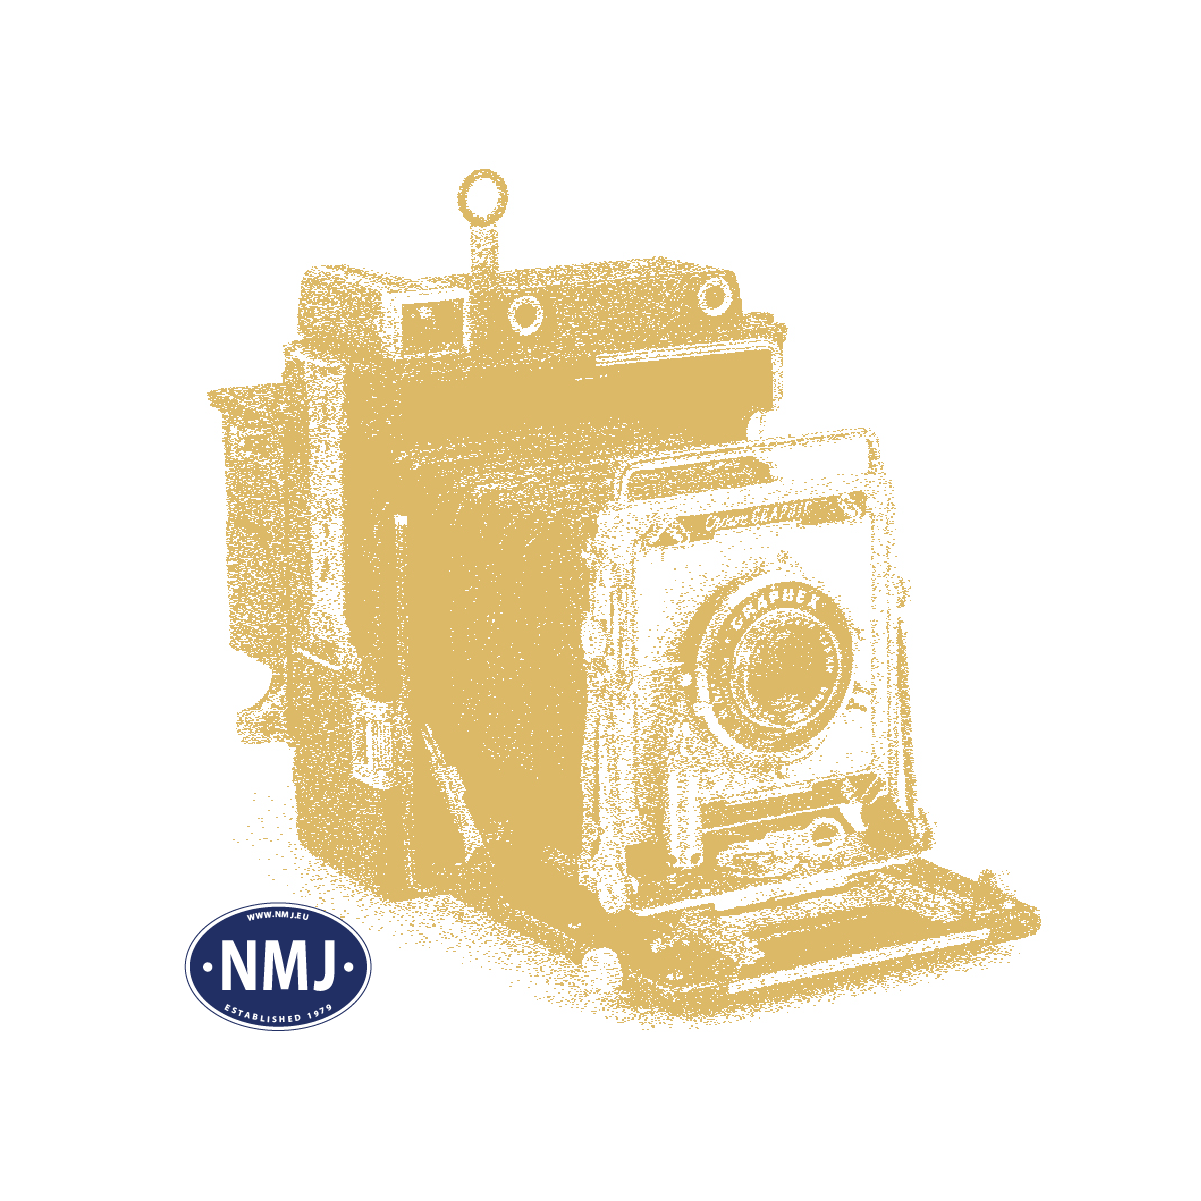 "NMJT90010 - NMJ Topline NSB Di3a 607 ""Nohab"", Mellomdesign, DCC Sound"